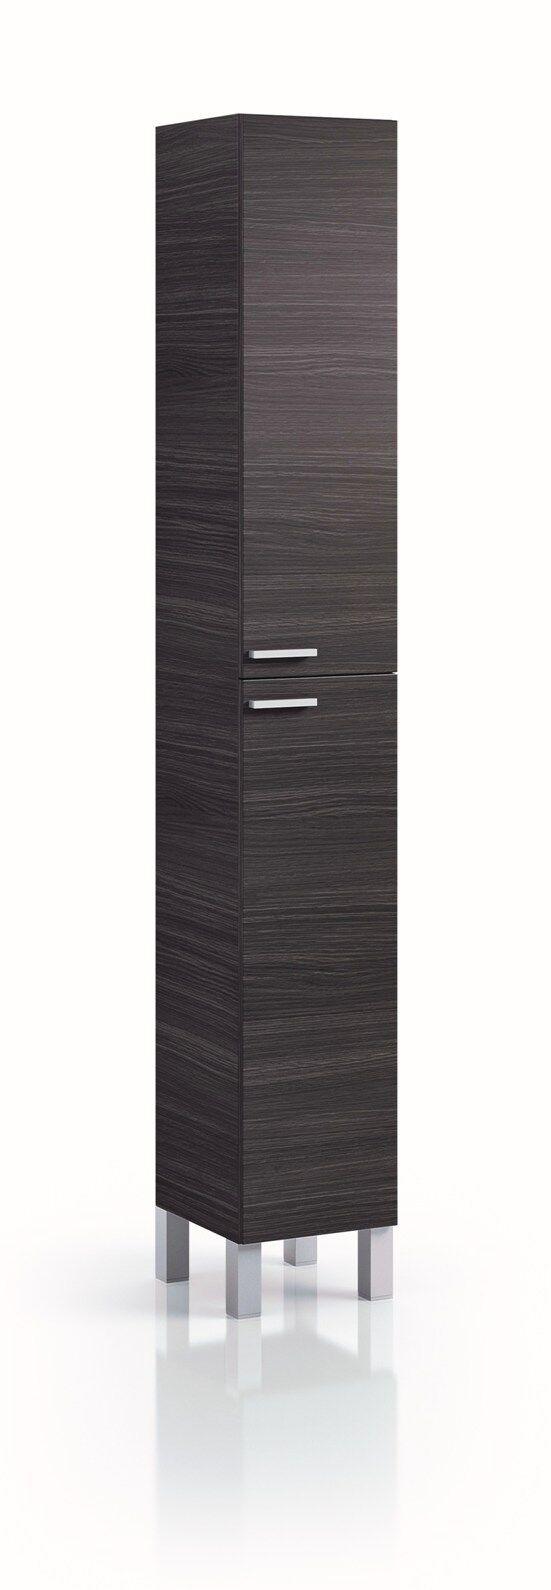 Koncept Tall Narrow Bathroom Cupboard Storage Cabinet Soft Gloss White Ash Grey Ebay